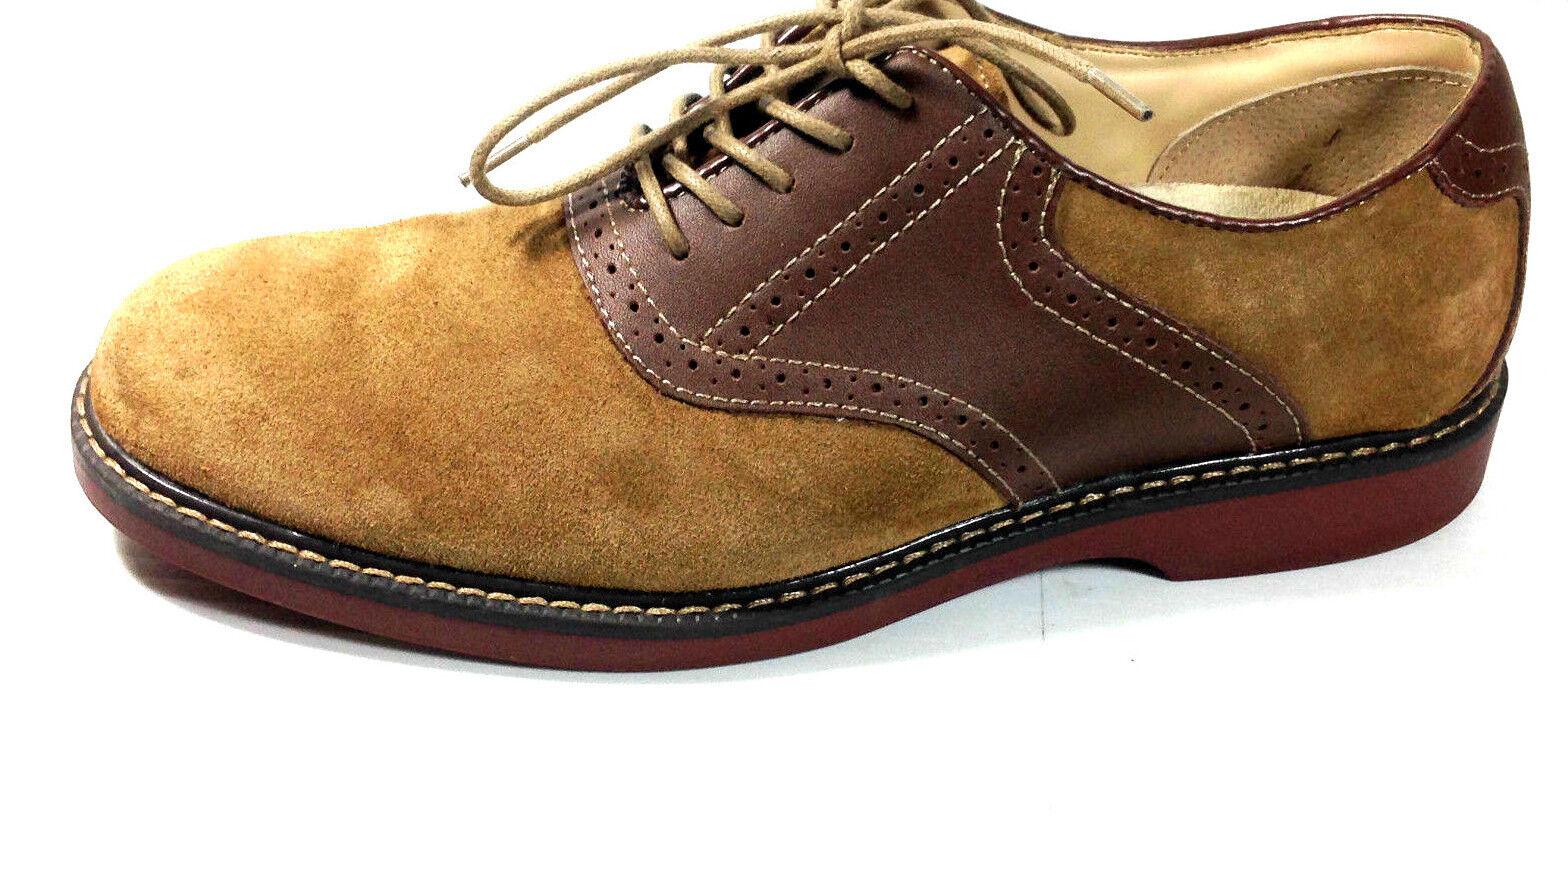 G.H. Bass Signature Oxford Saddle shoes Pomona Taupe Suede Size  U.S. 8.5